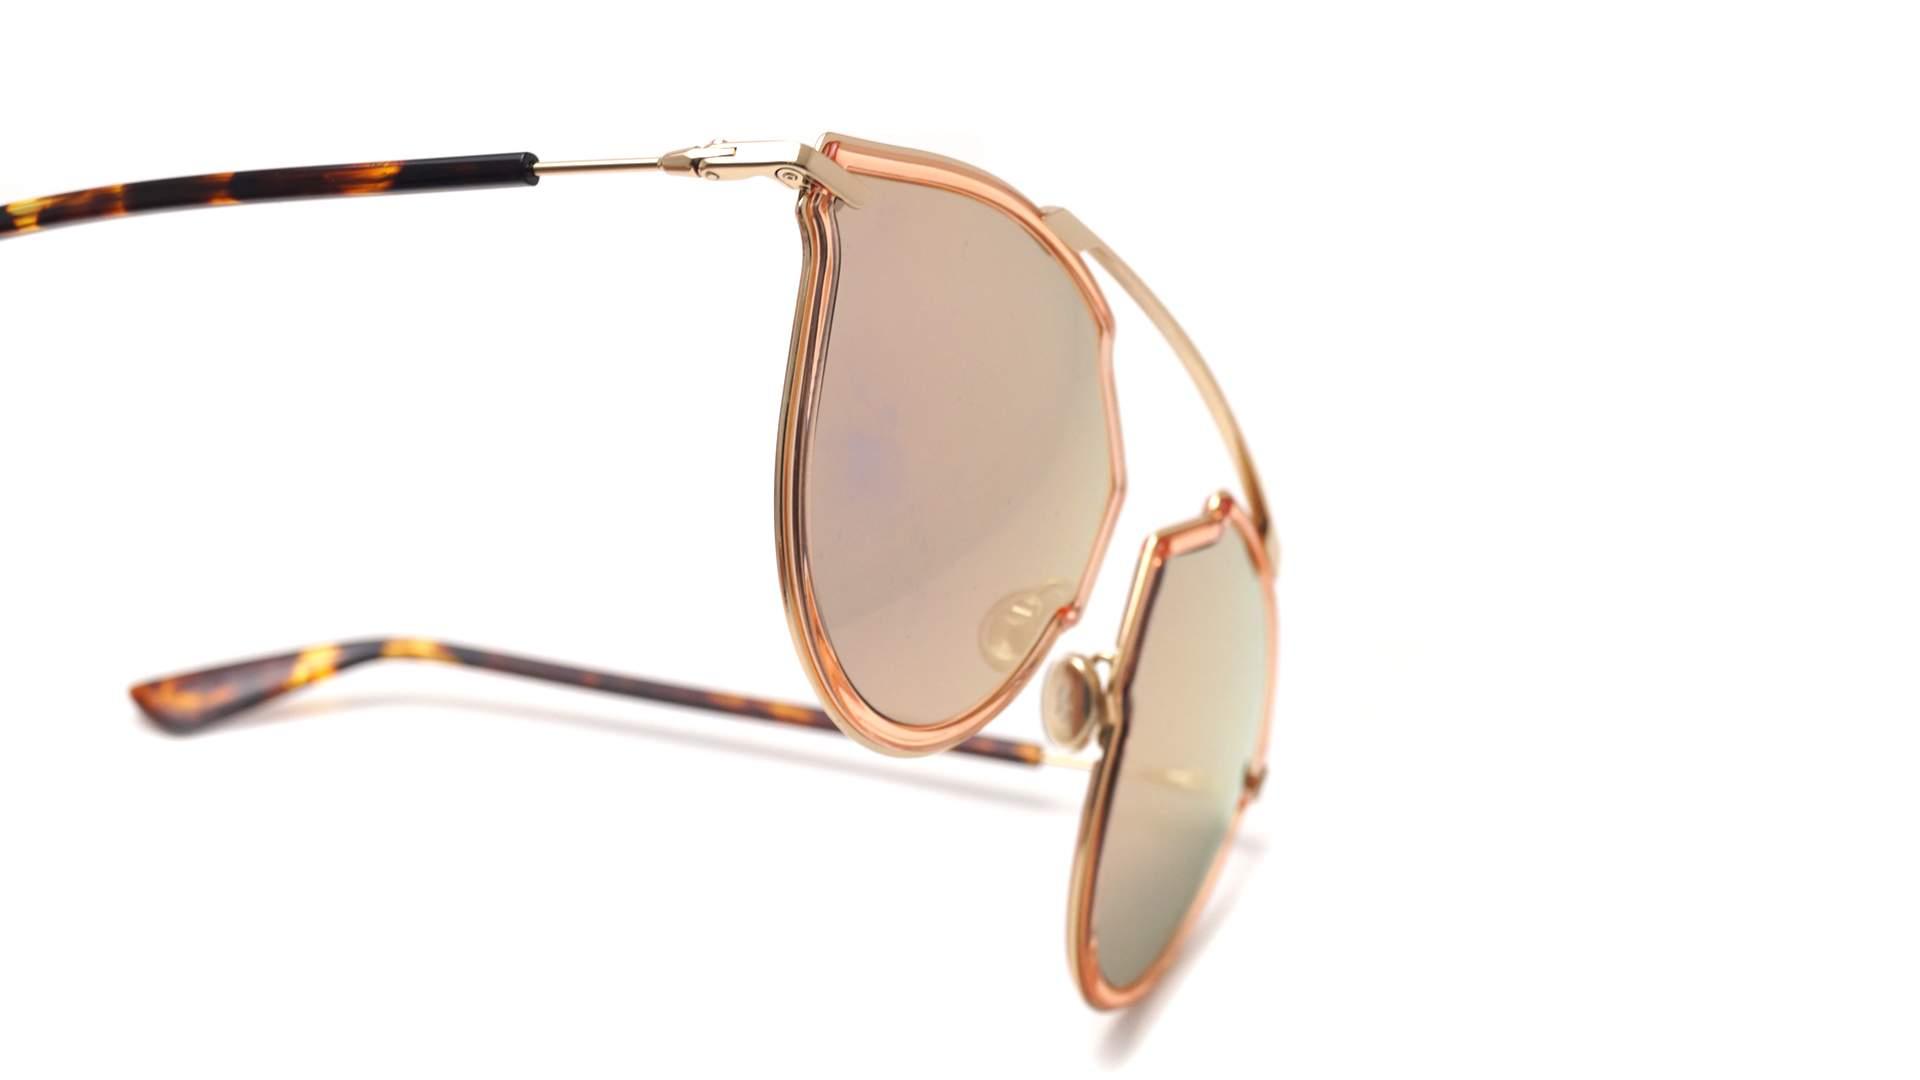 dc427e2dc0ef5 Sunglasses Dior SoReal Rise Pink DIORSOREALRISE S450J 58-17 Large Mirror